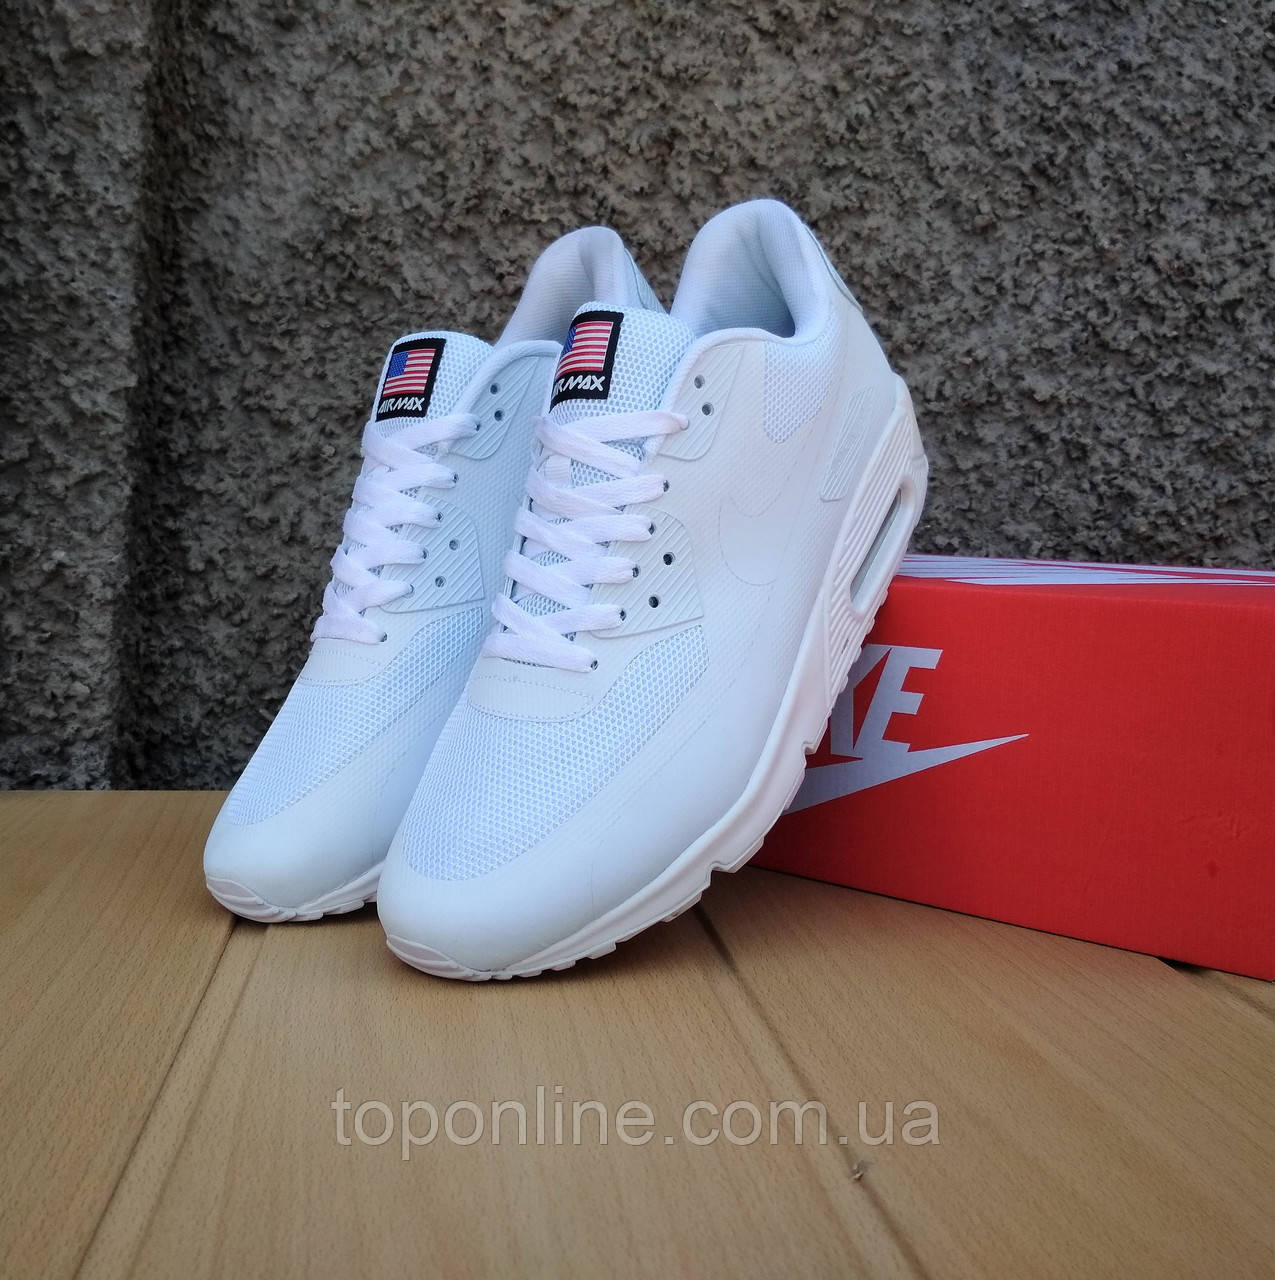 Кроссовки Nike Air Max Hyperfuse Independence Day white - В кроссовках UA в  Запорожье 6f2319dfd05